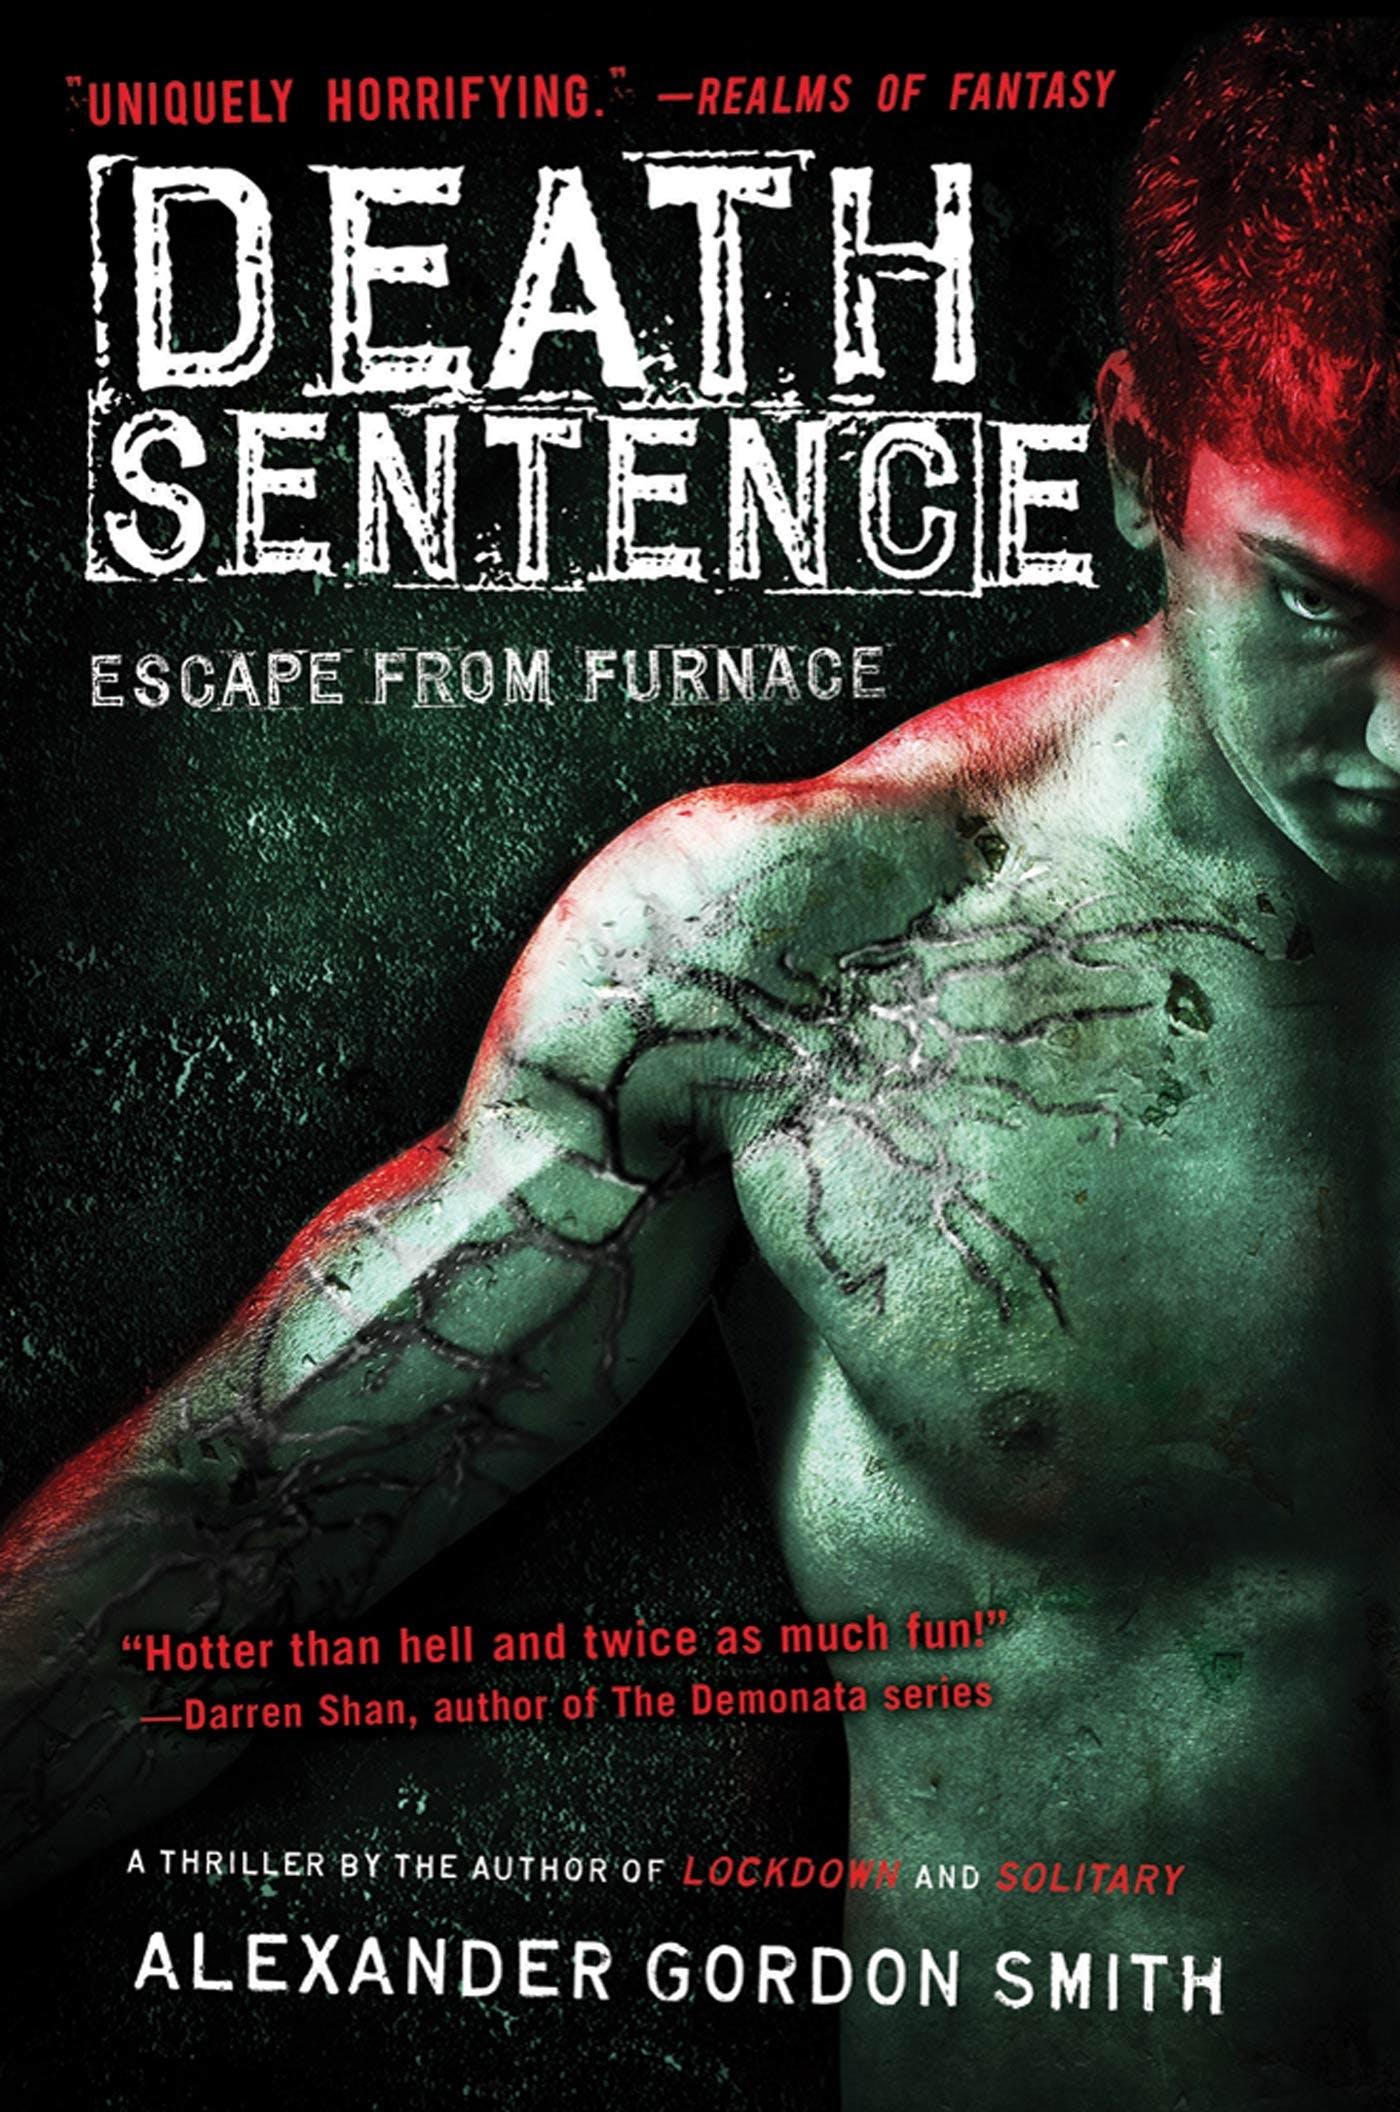 Image of Death Sentence